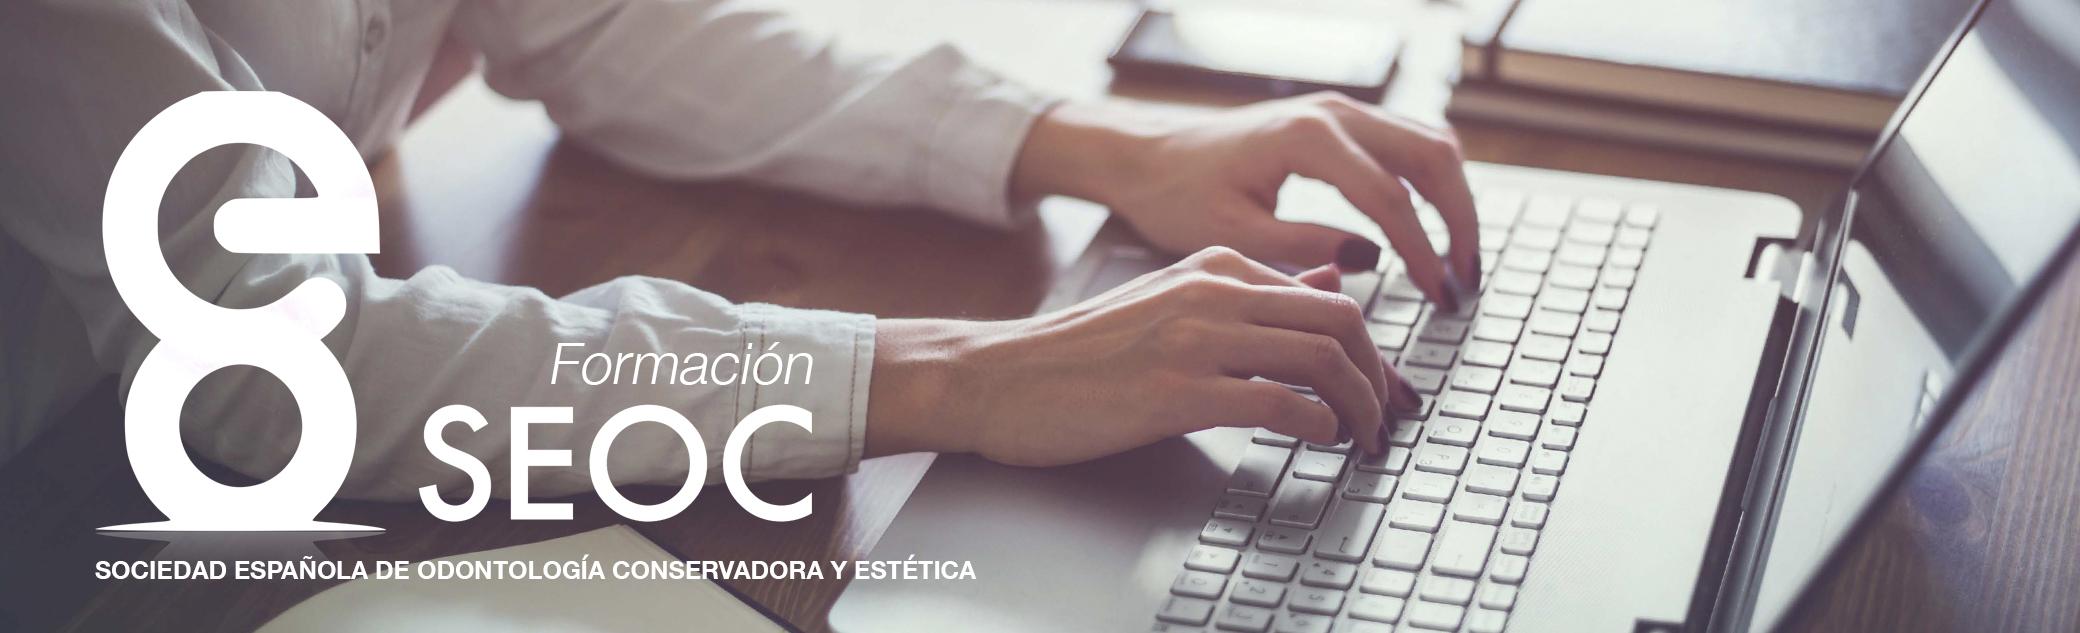 Formación online SEOC